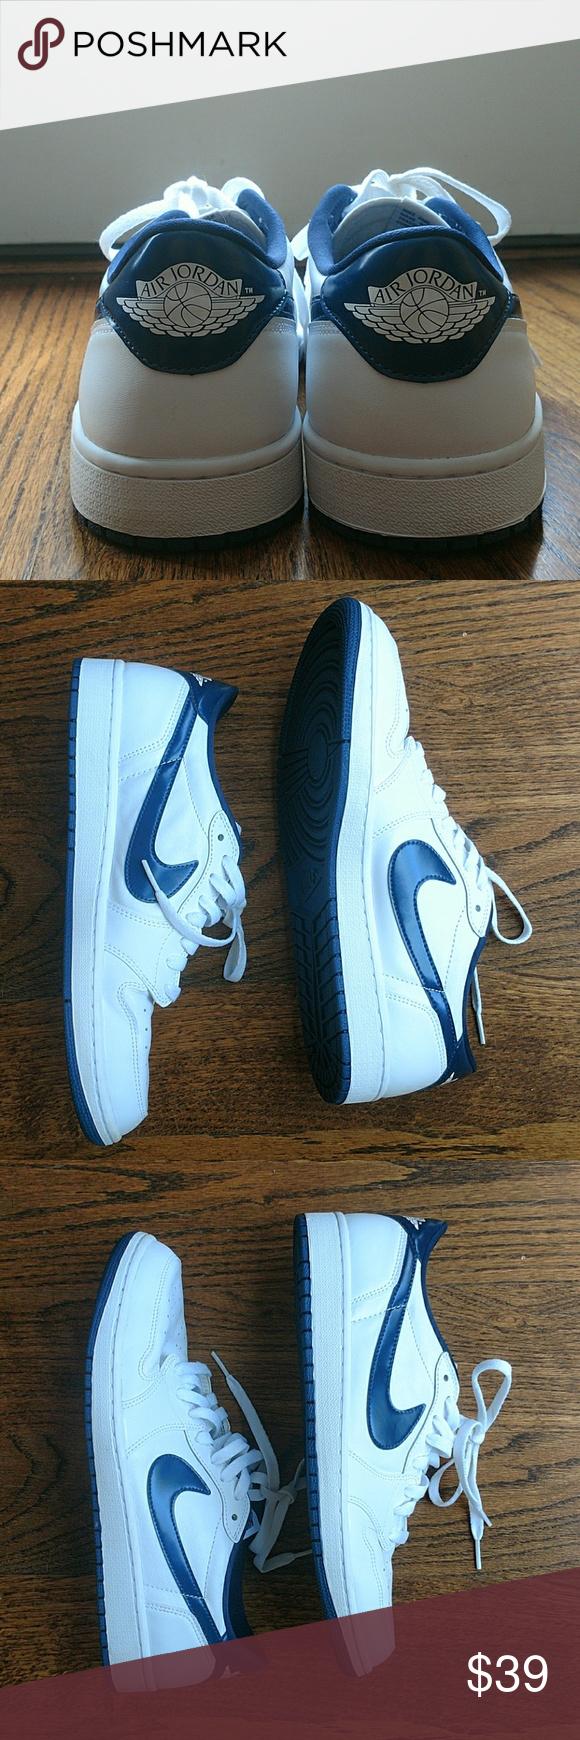 Nike Jordan 1s Nike Jordan 1 shoes, very lightly worn and